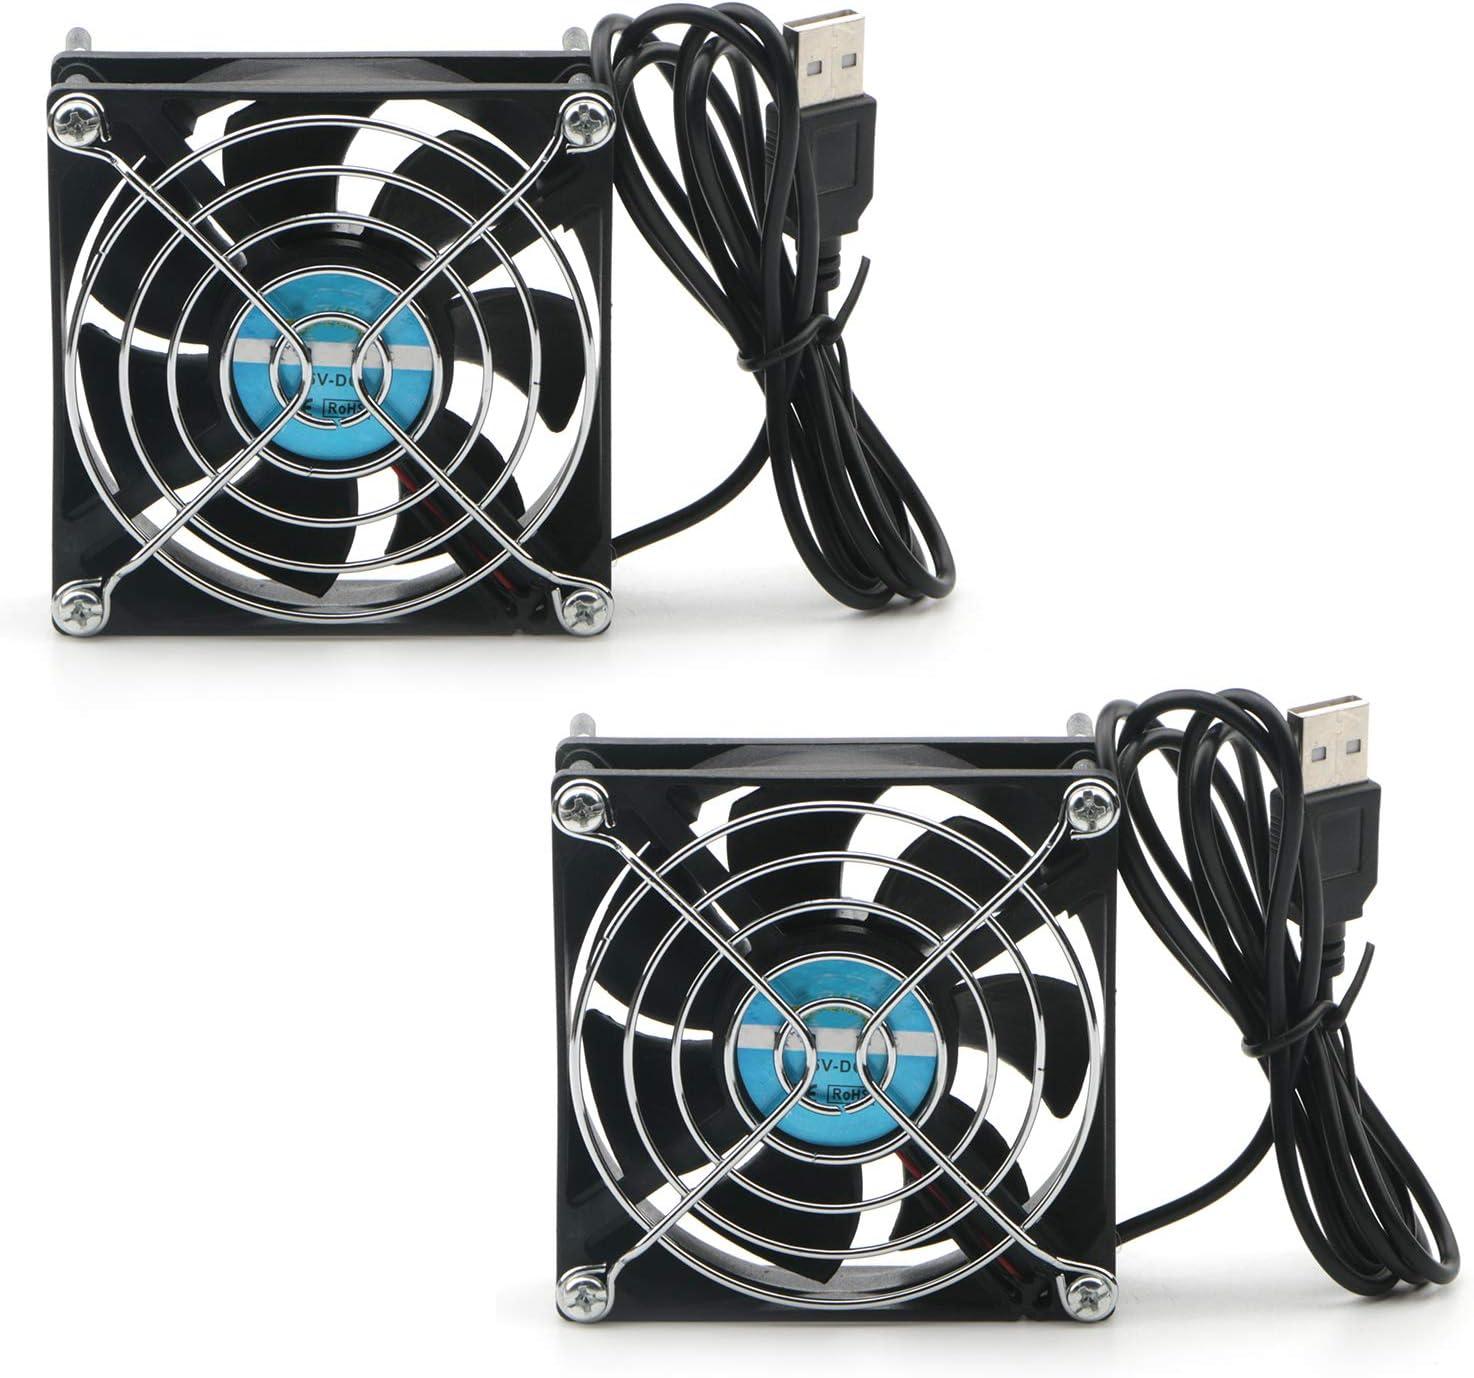 USB Cooling Fan Silent Computer Case PC CPU DC 5V  Cooler Heat dissipation Black